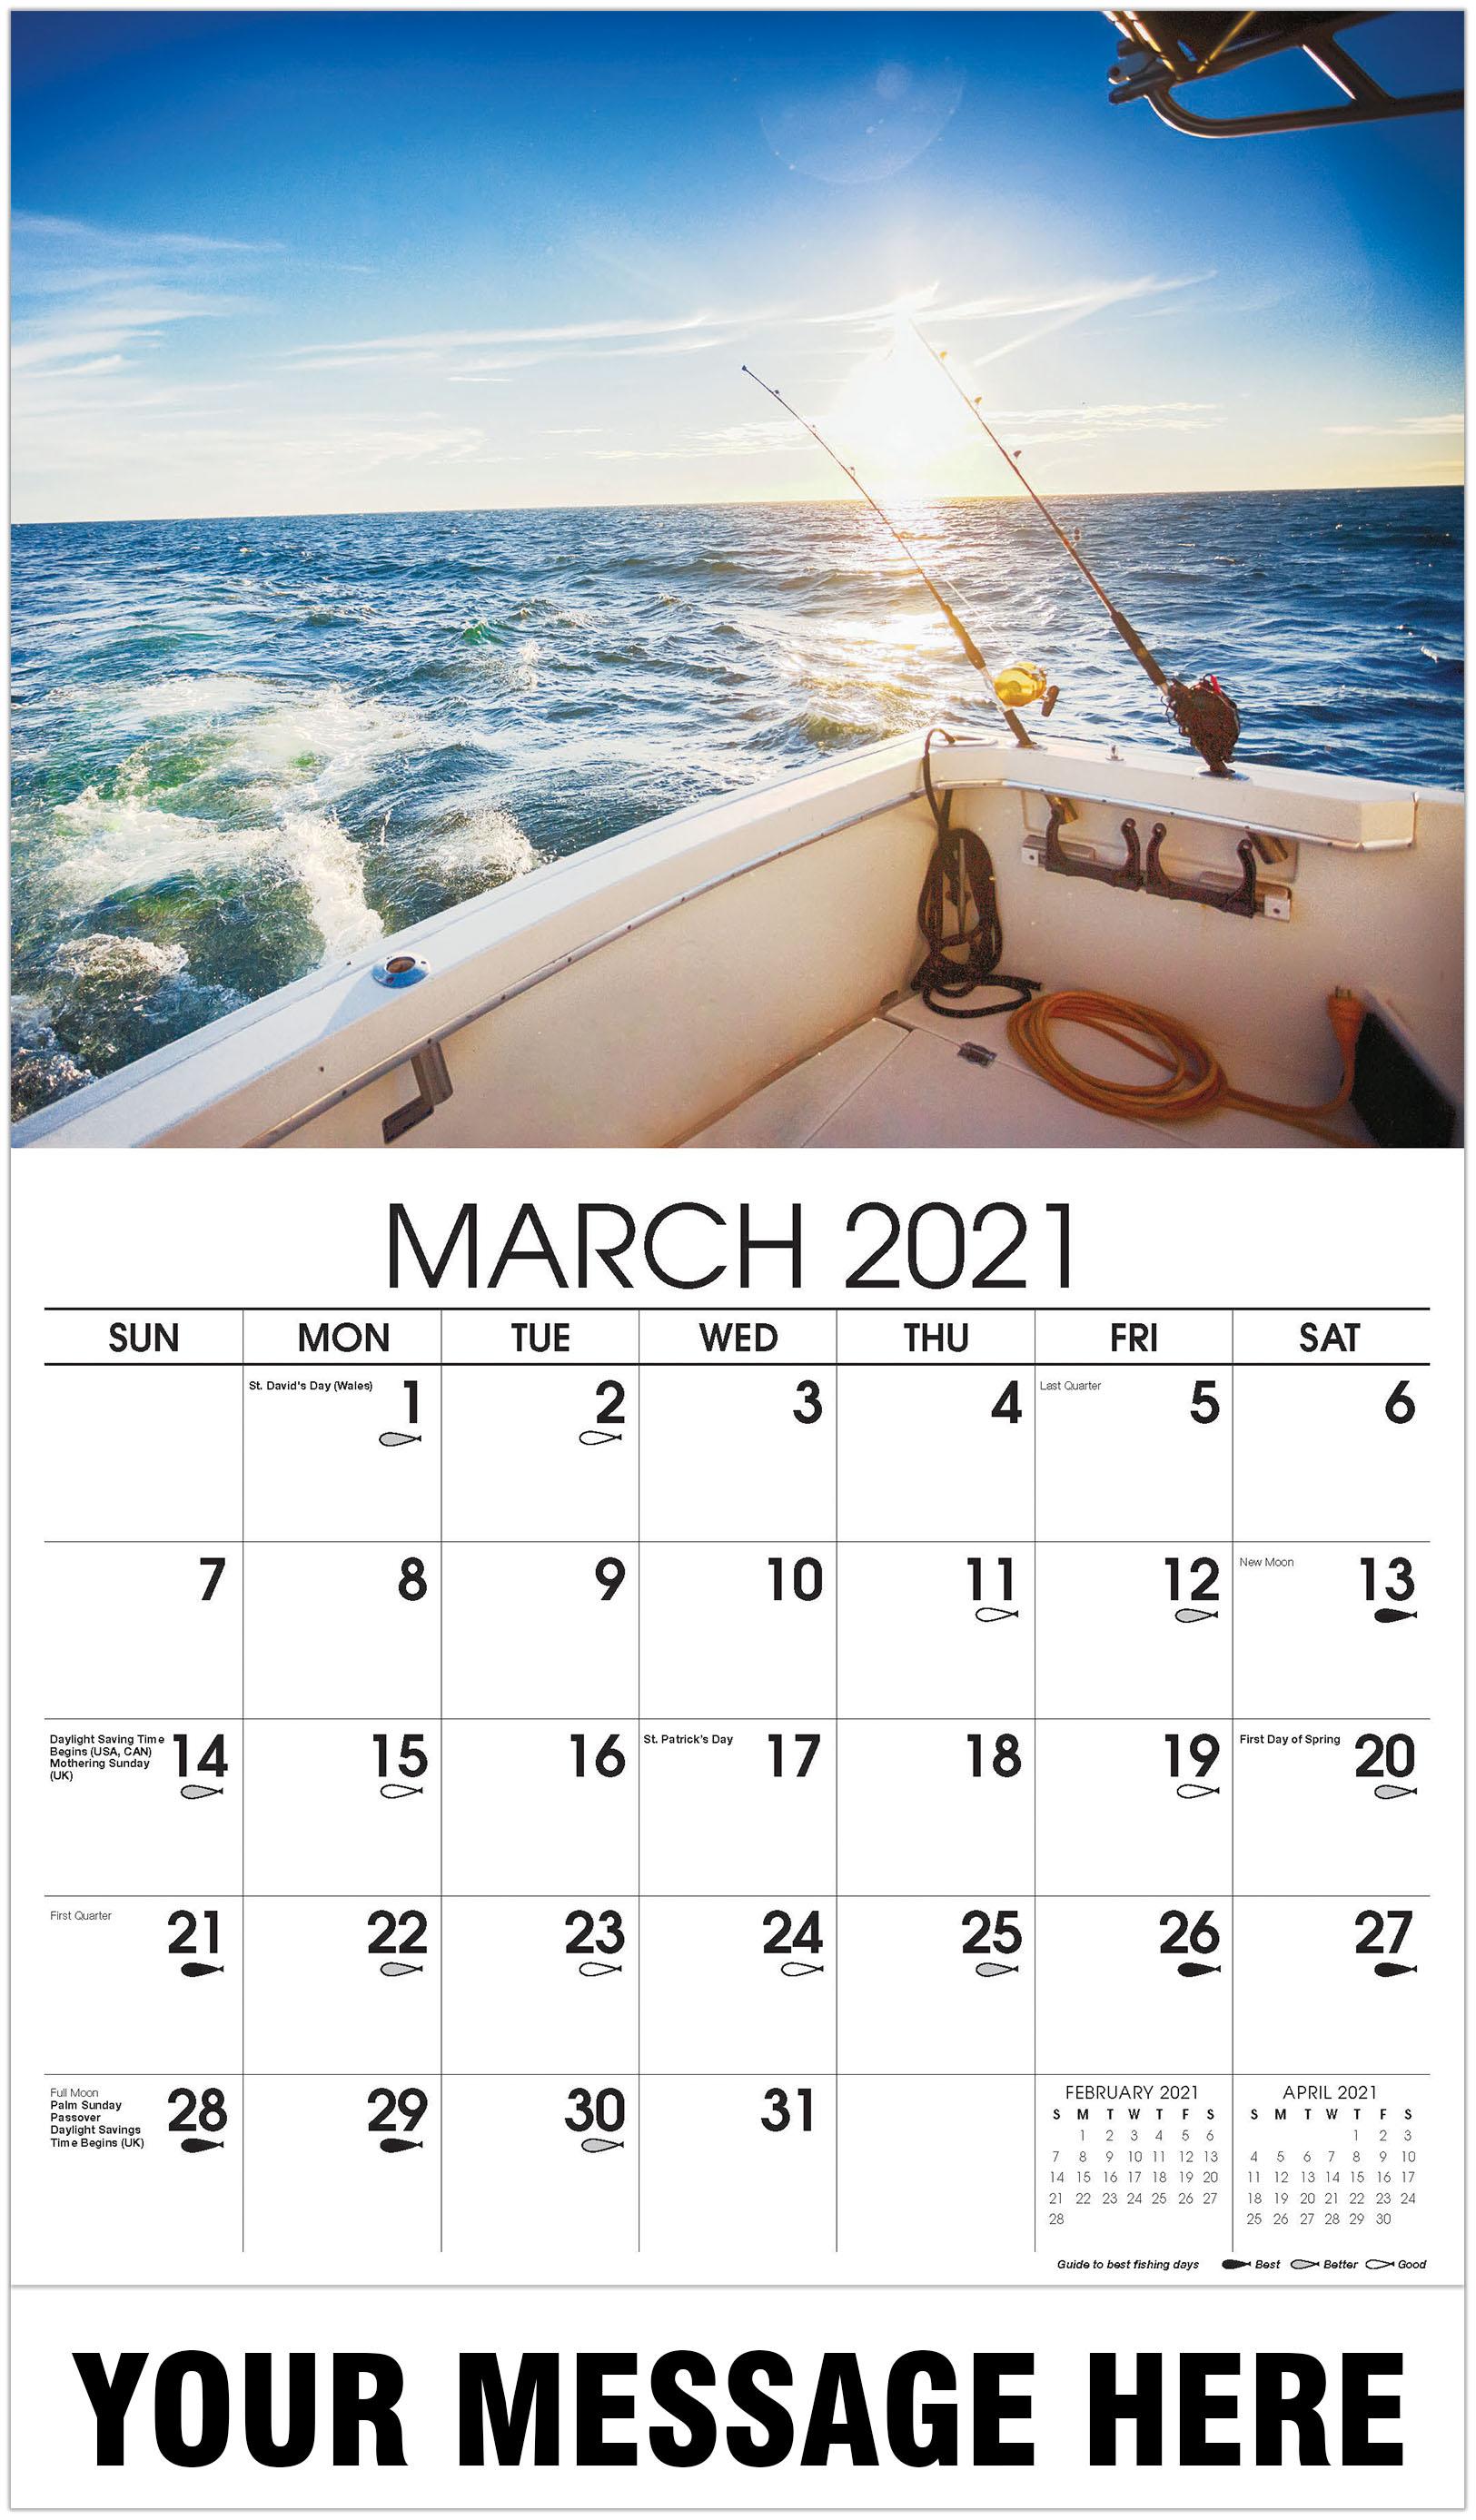 Fishing Reel - March - Fishing & Hunting 2021 Promotional Calendar